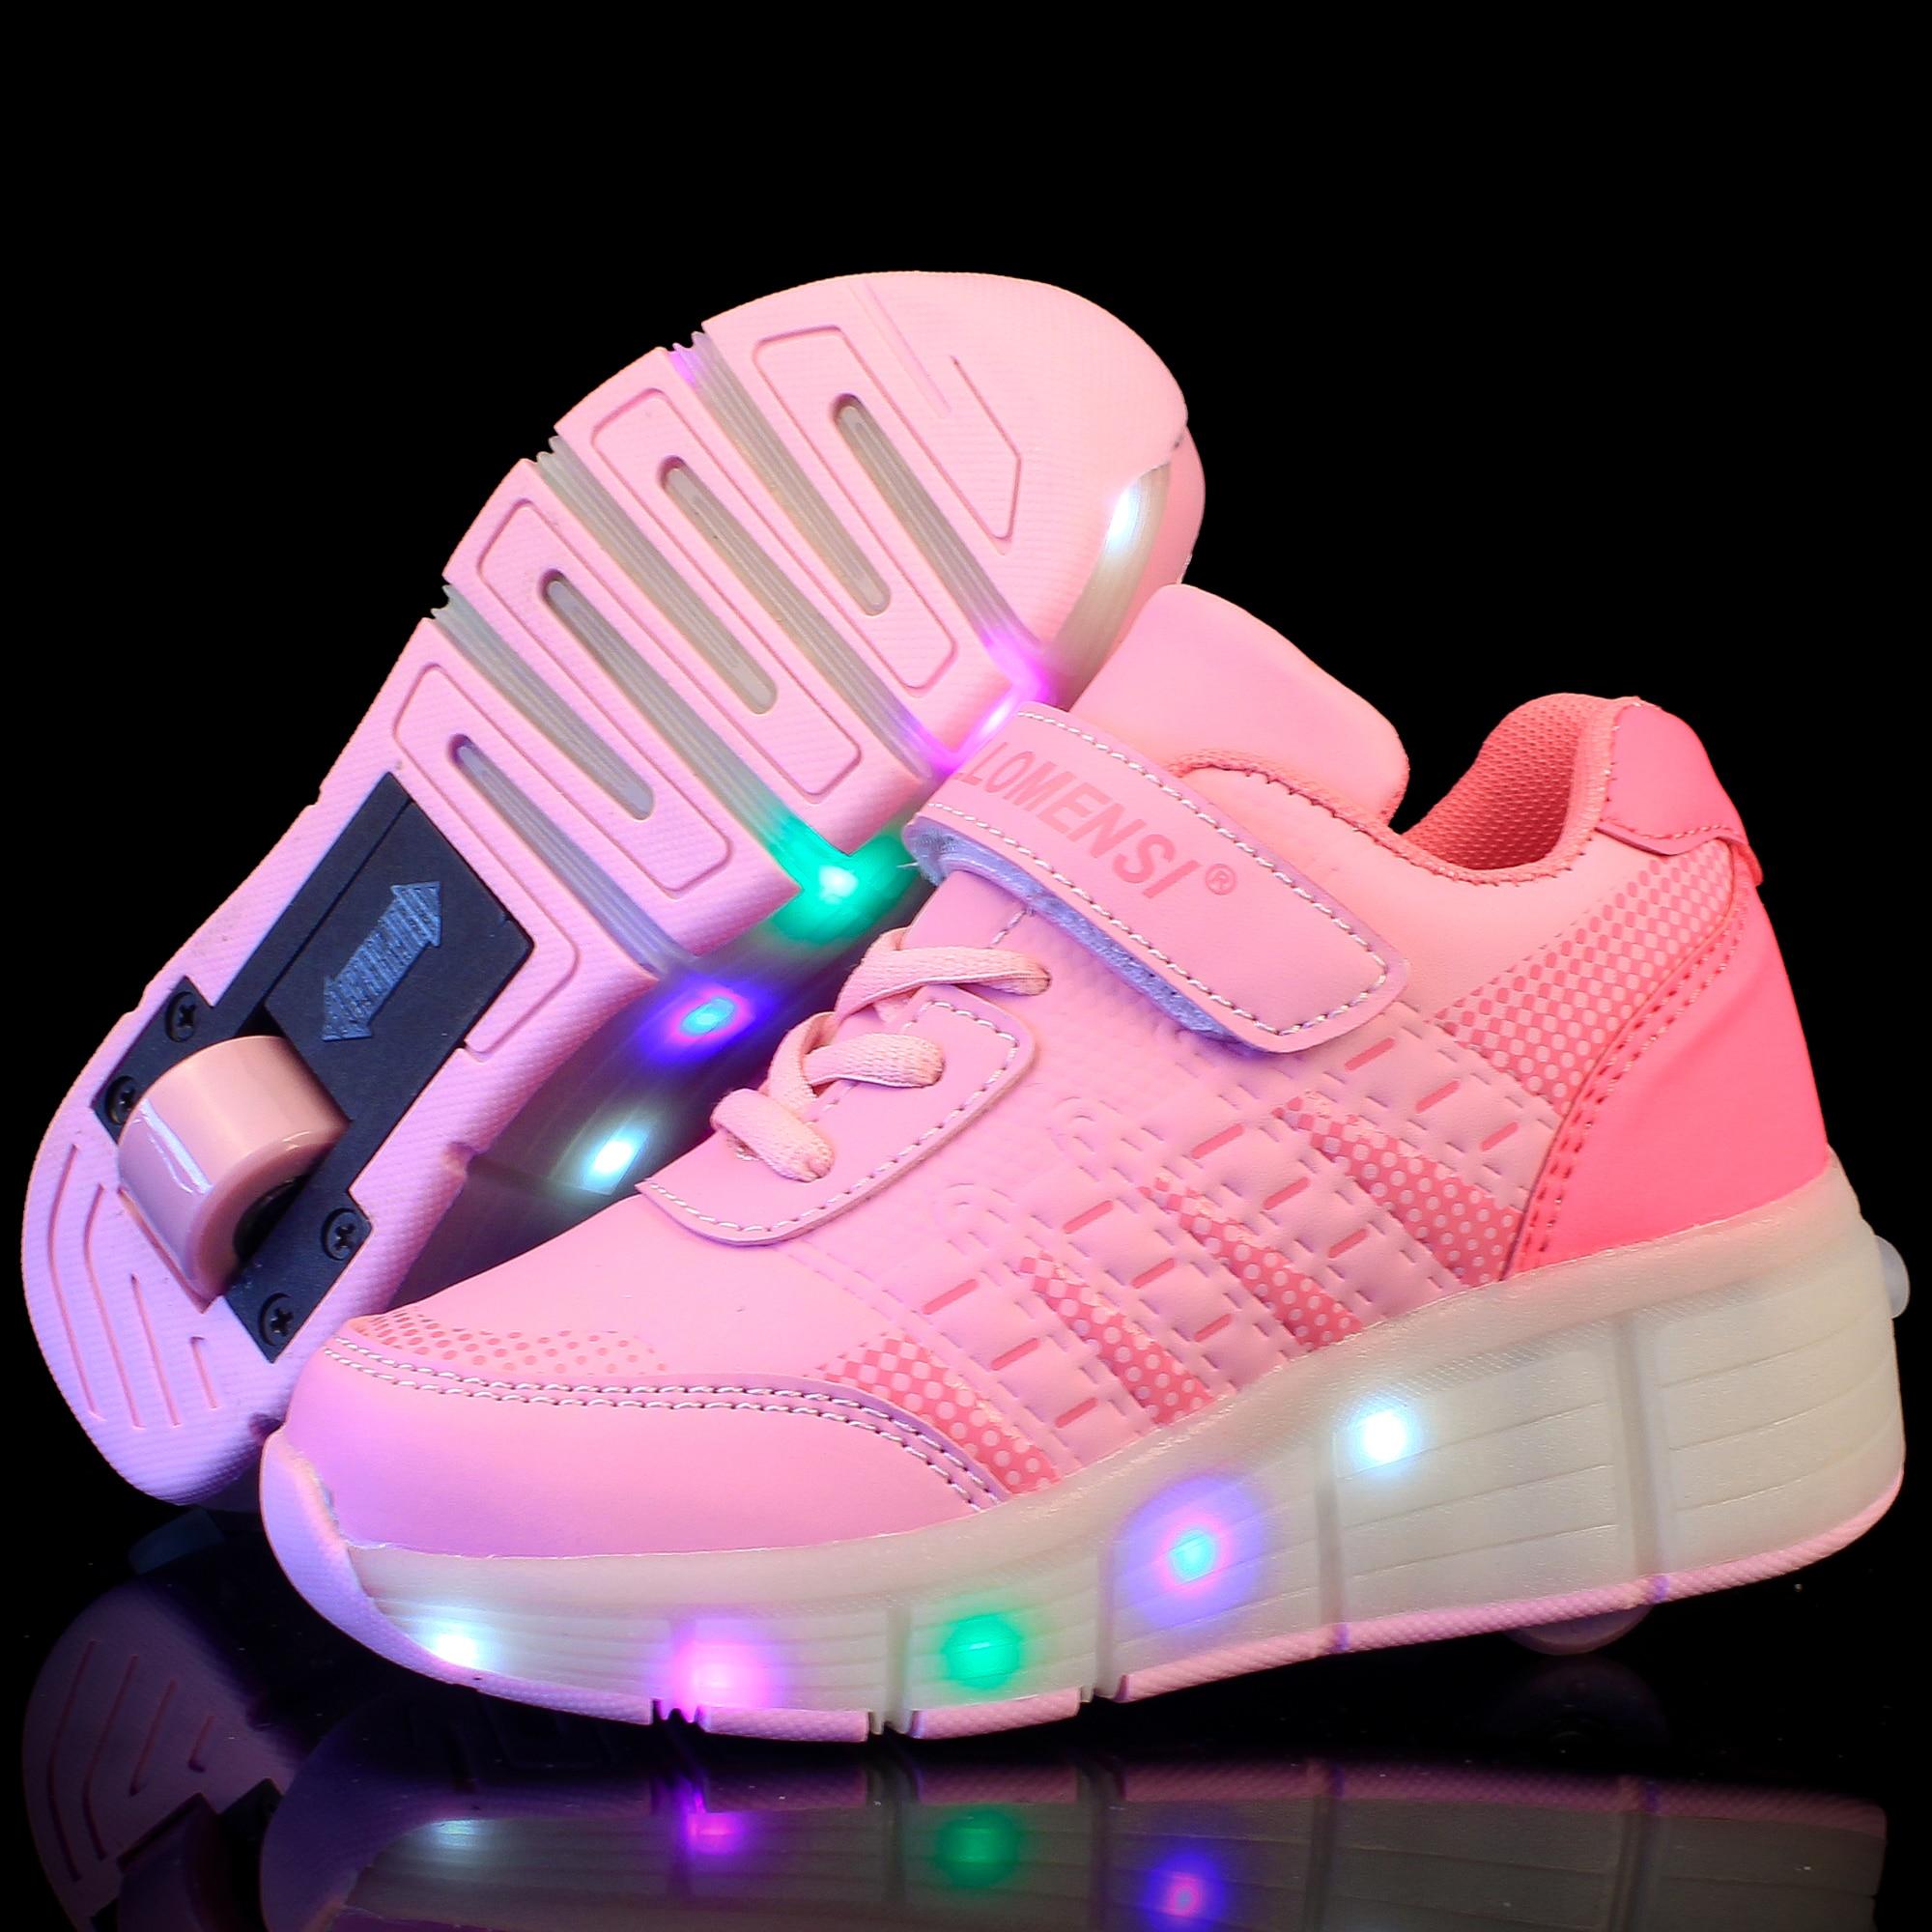 Heely skate shoes reviews - New 2016 Child Wheel S Jazzy Led Light Wheel Roller Skate Shoes For Children Kids Junior Girls Boys Sneakers With Wheels